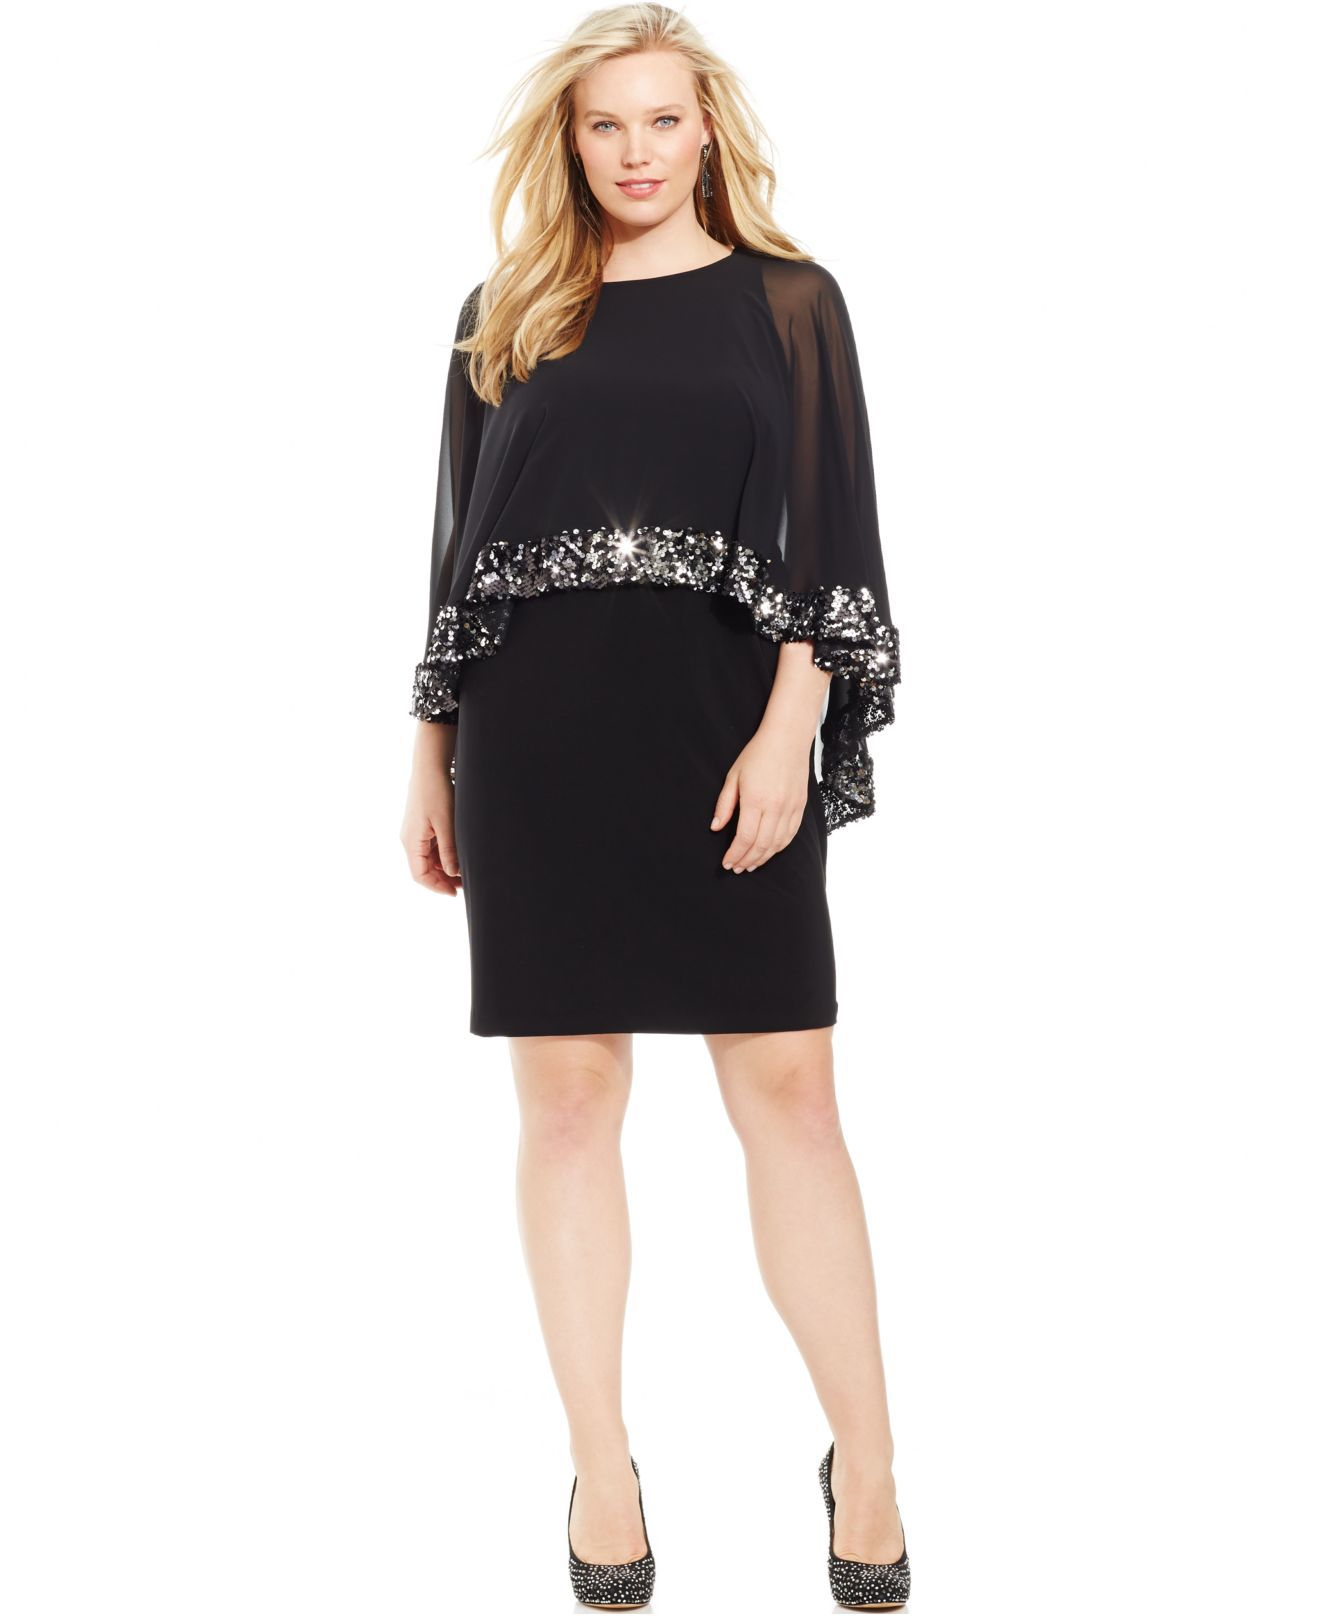 https://www.lyst.co.uk/clothing/betsy-adam-plus-size-sequin